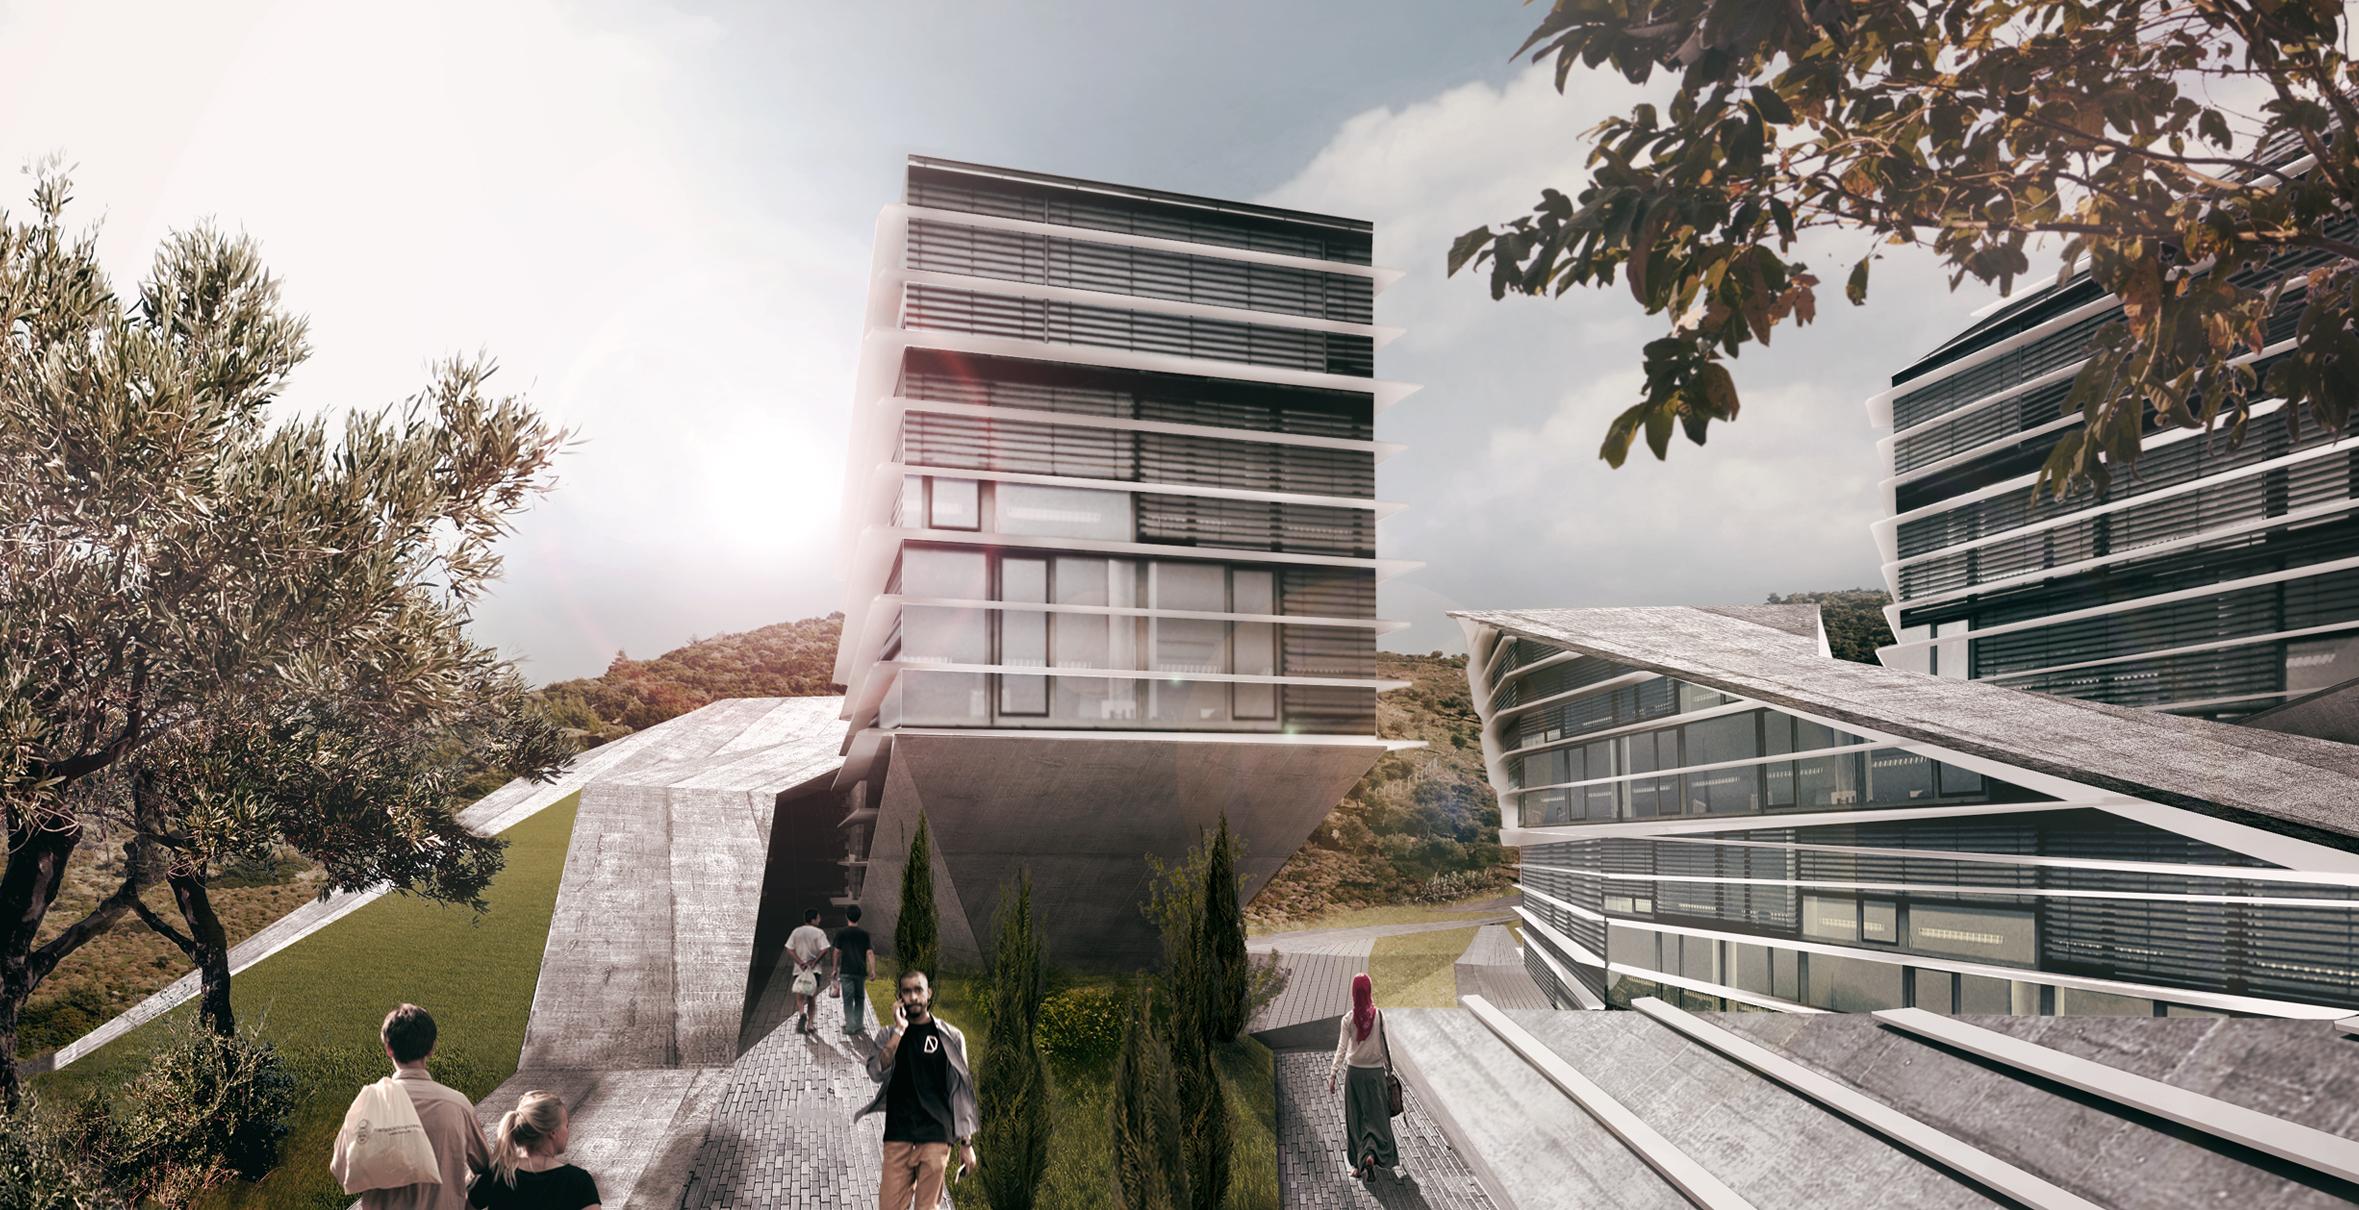 Izmir university render, Plasma studio